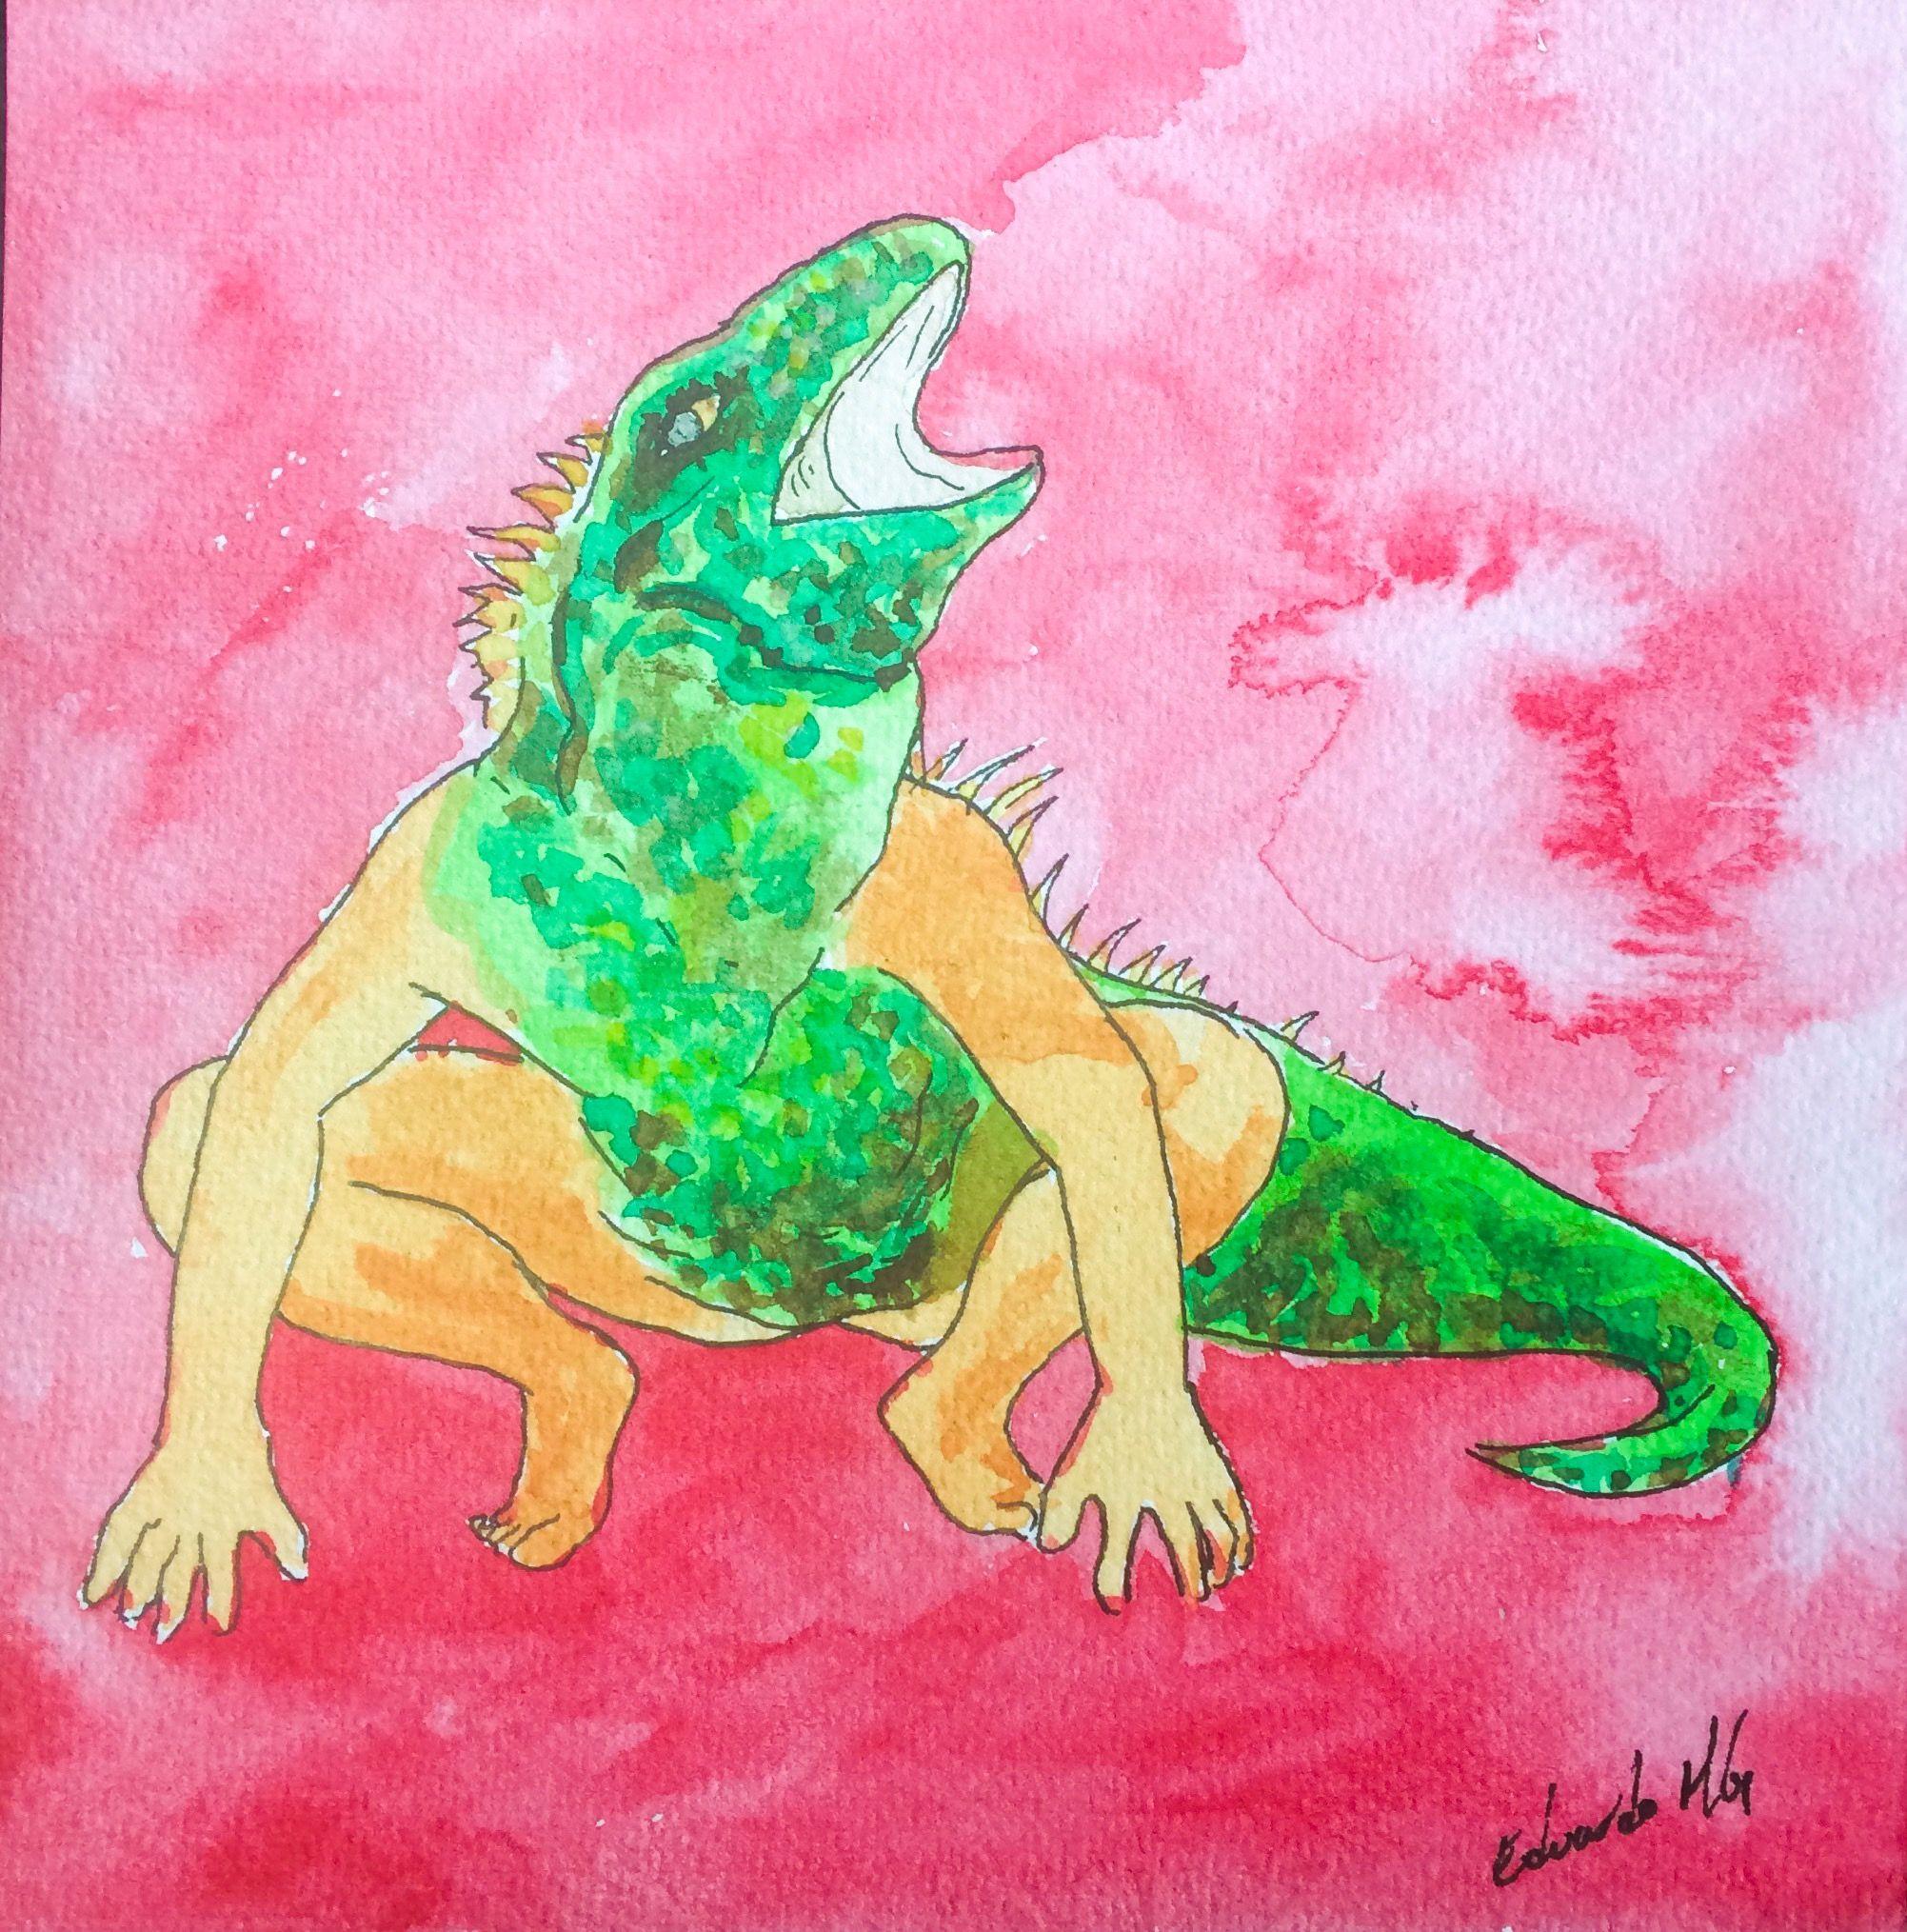 Art Drawing Watercolor Arte Dibujo Acuarela El Hombre Caiman Drawing Arte Painting